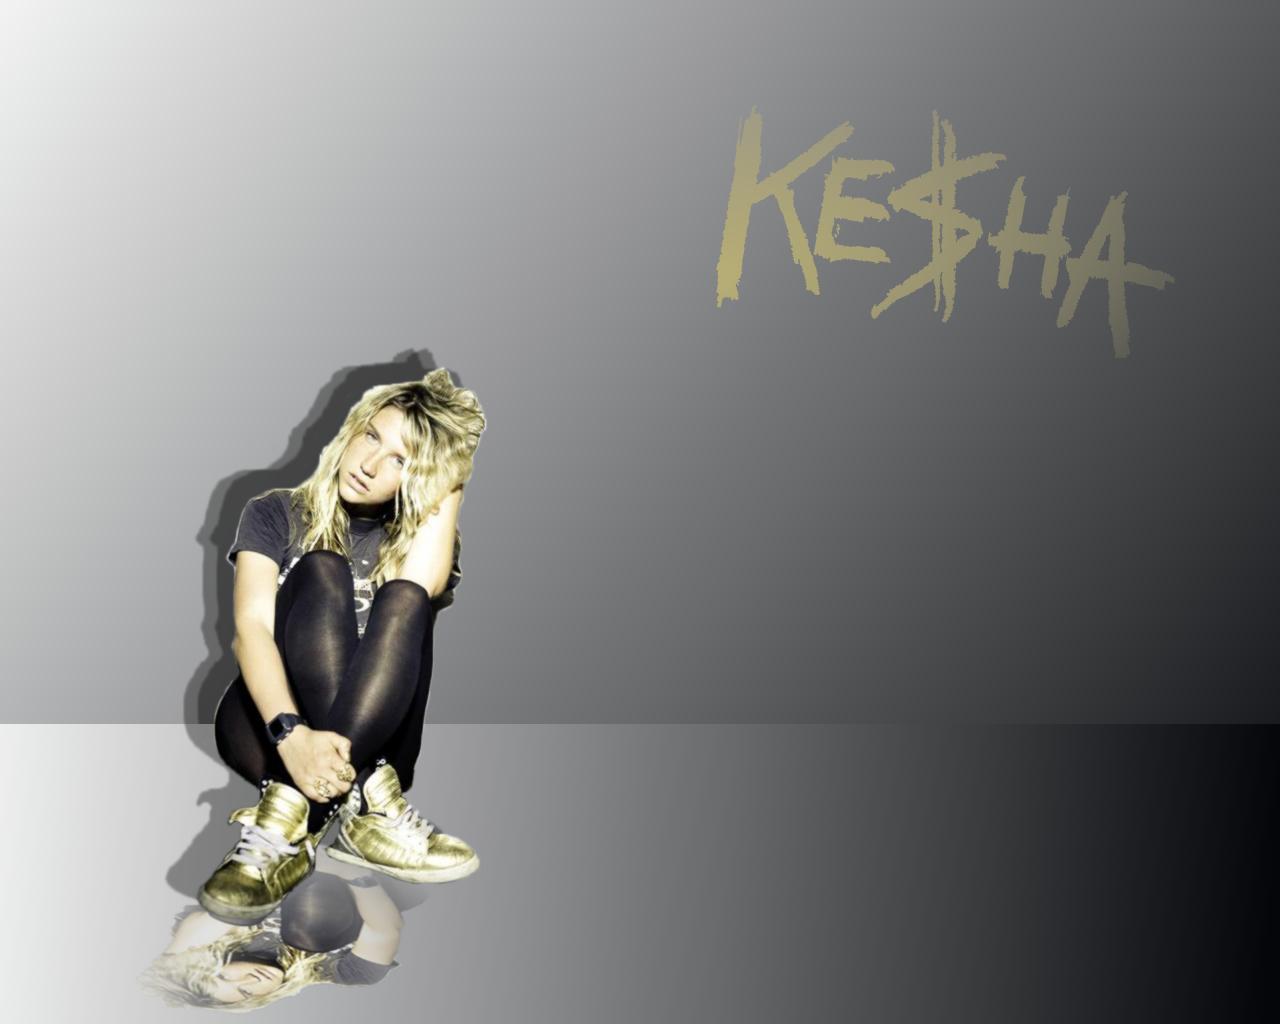 Pretty Ke$ha Wallpaper - kesha wallpaper